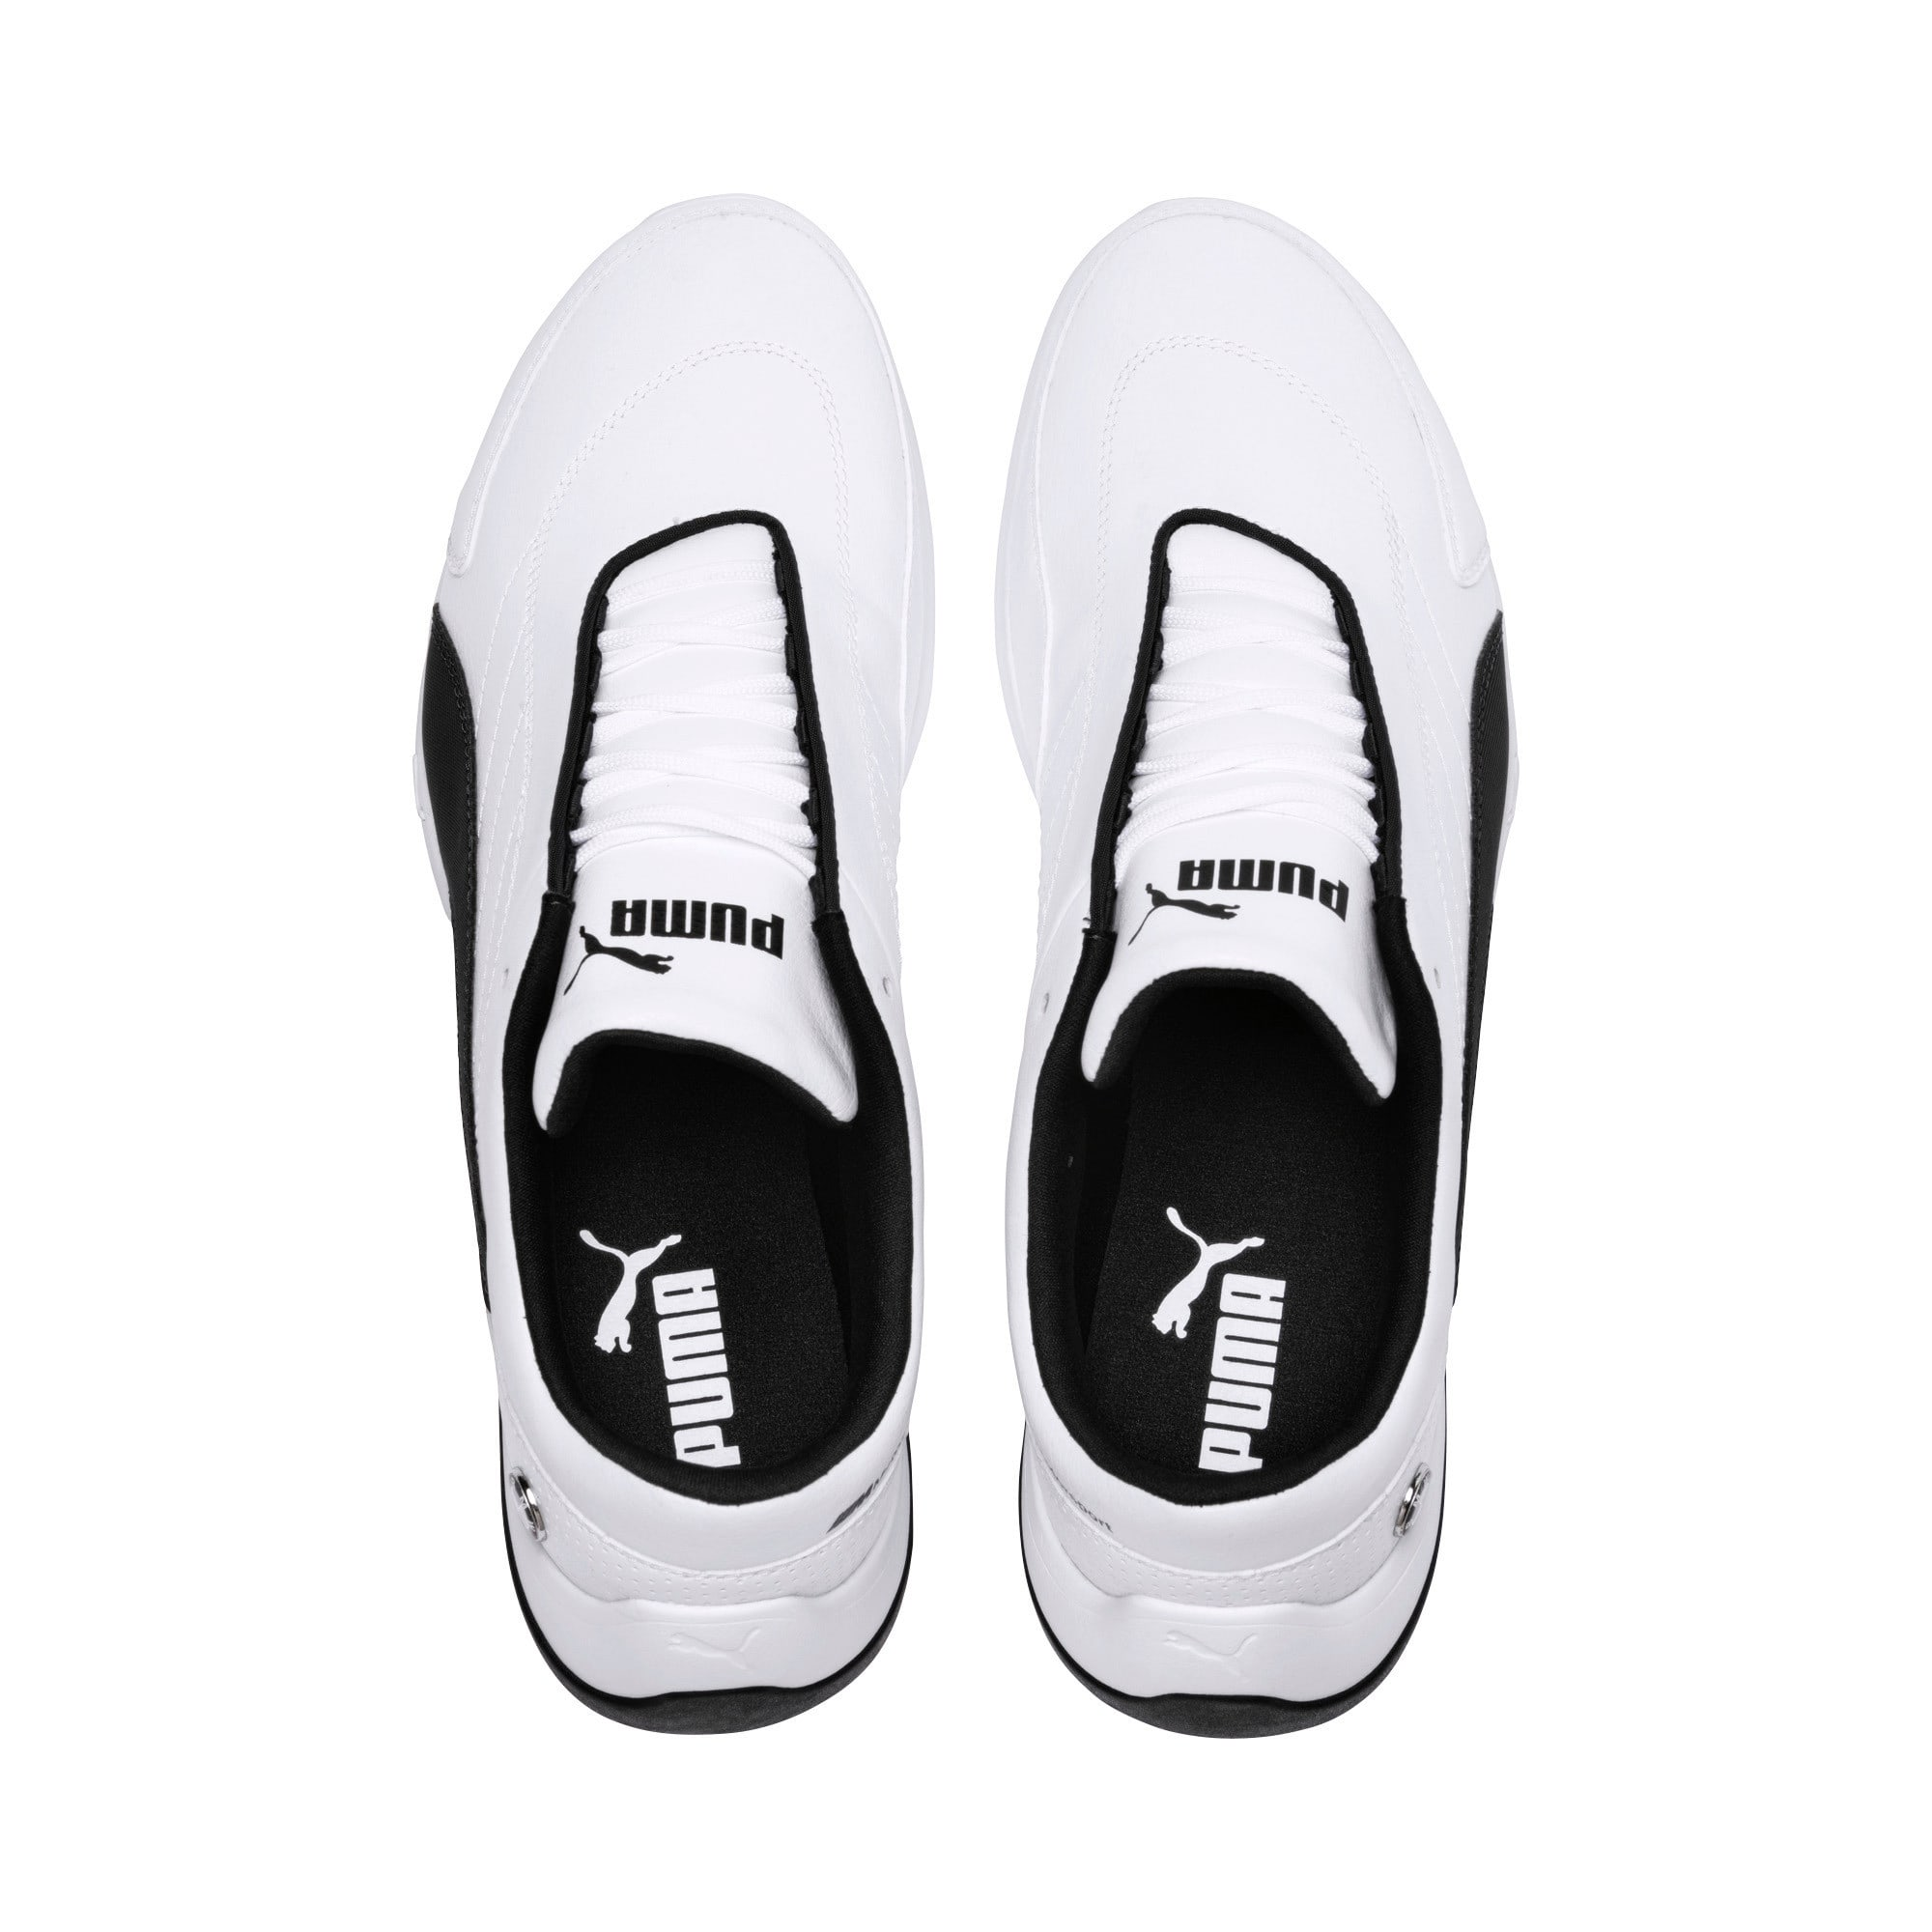 Thumbnail 6 of BMW M Motorsport Kart Cat III Shoes, Puma White-Anthracite, medium